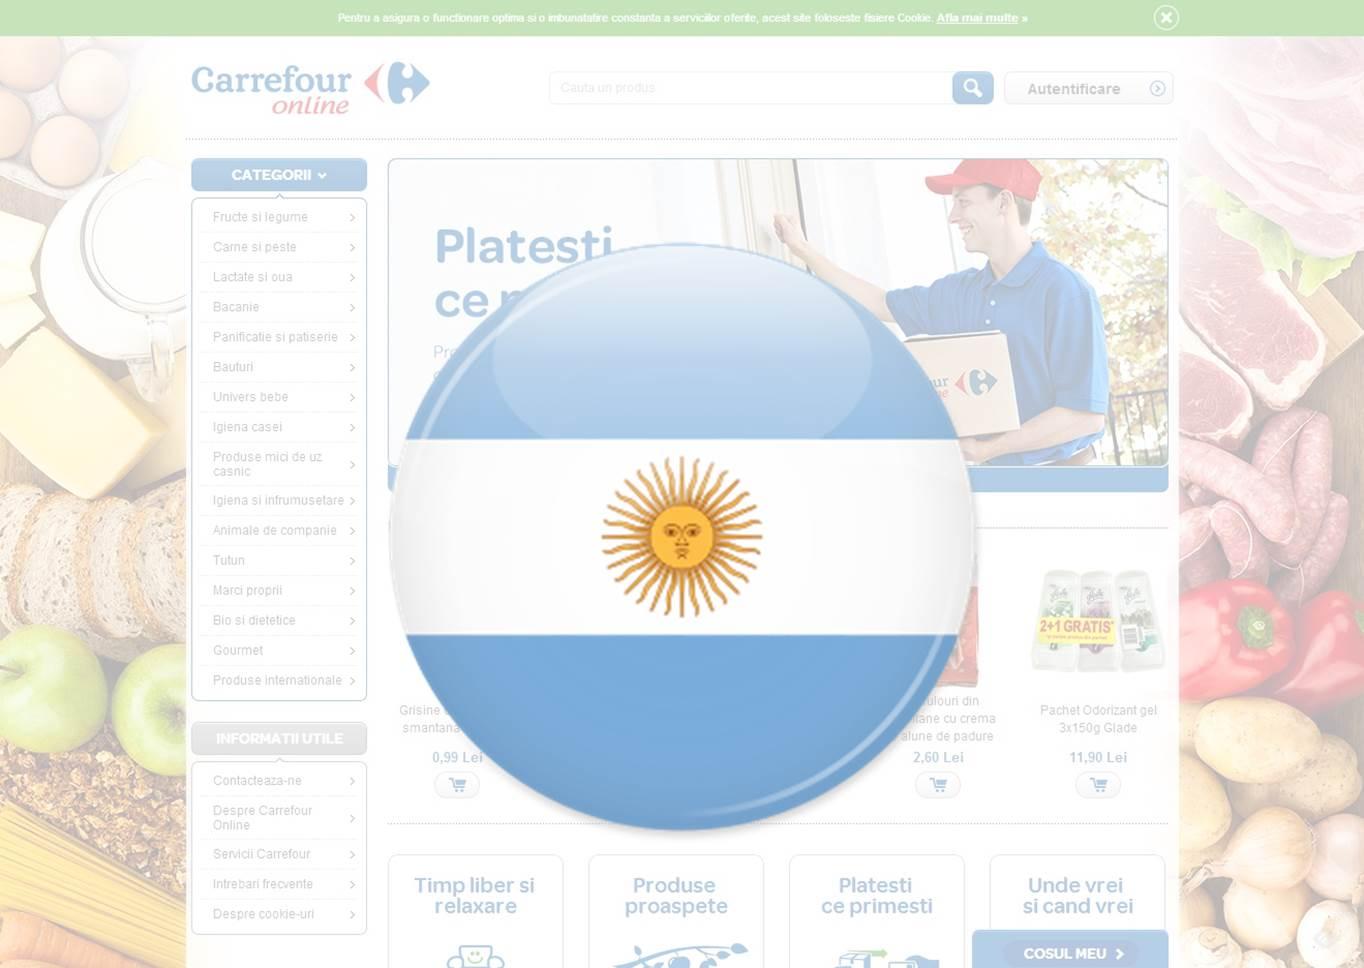 Carrefour Argentina online